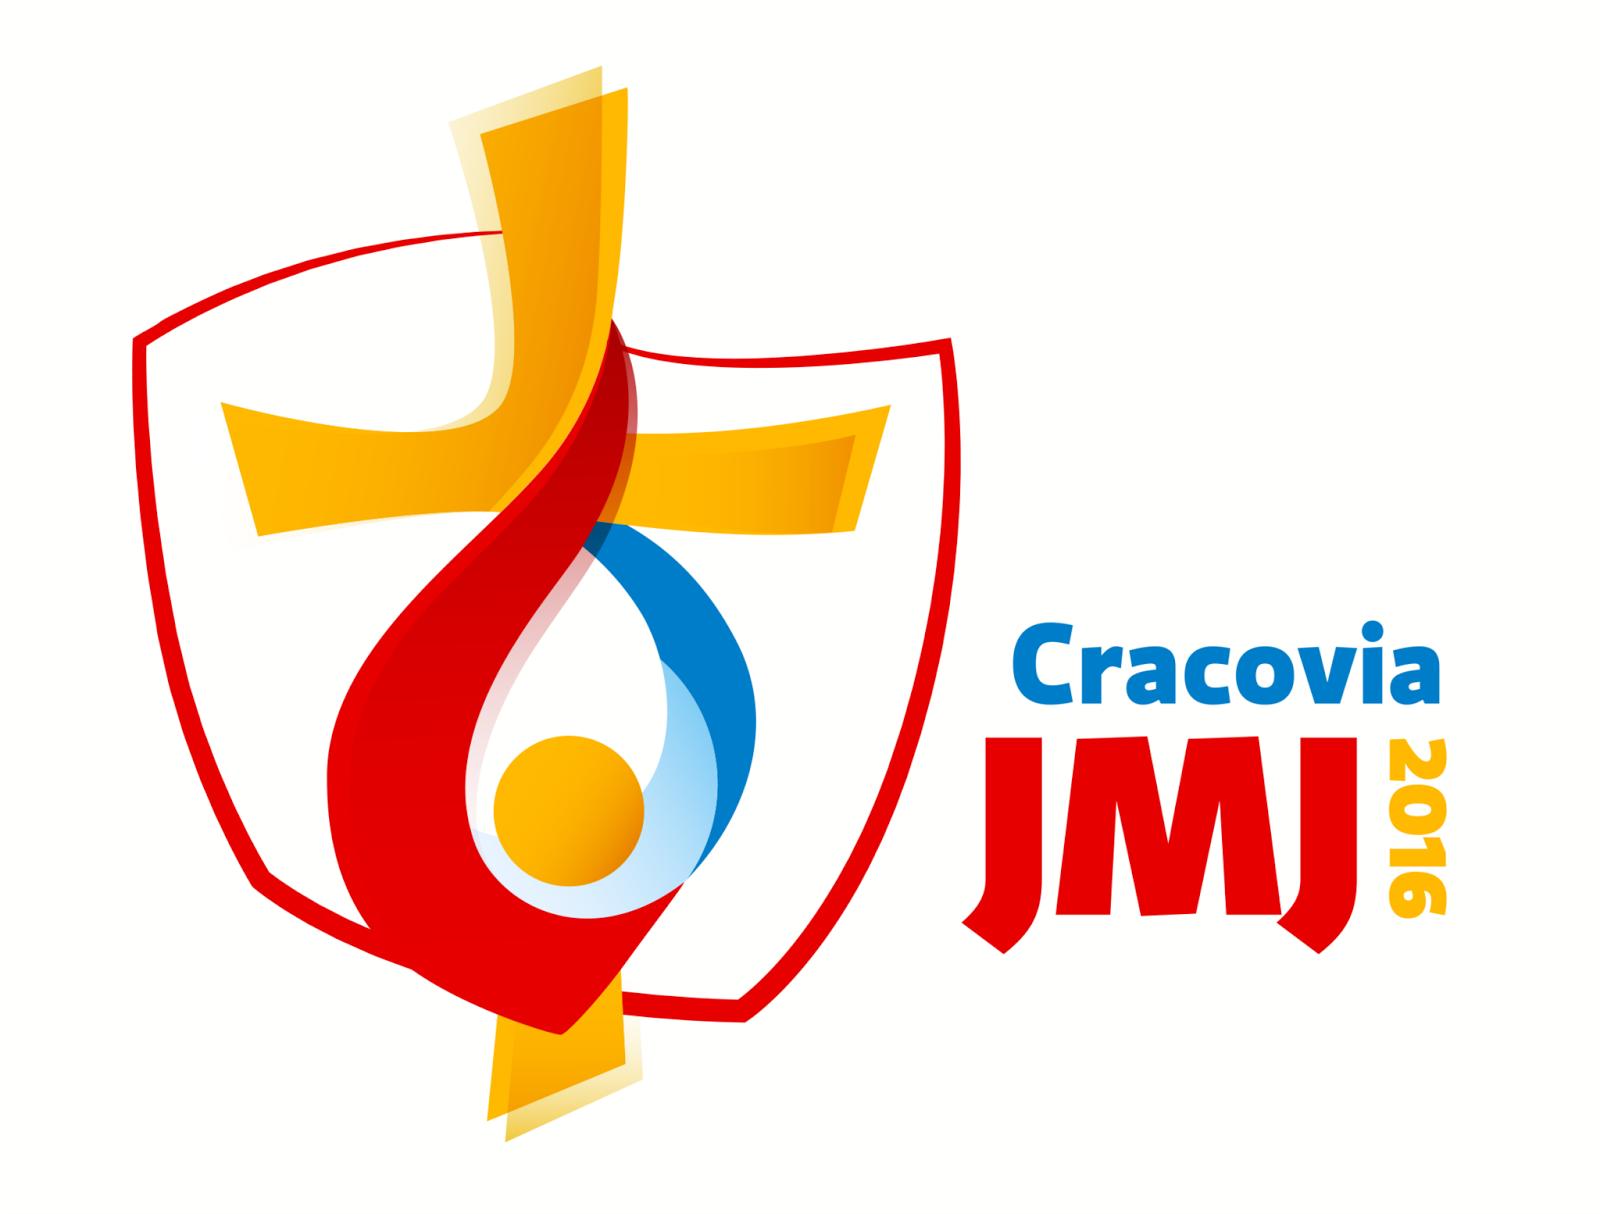 JMJ 2016 CRACOVIA